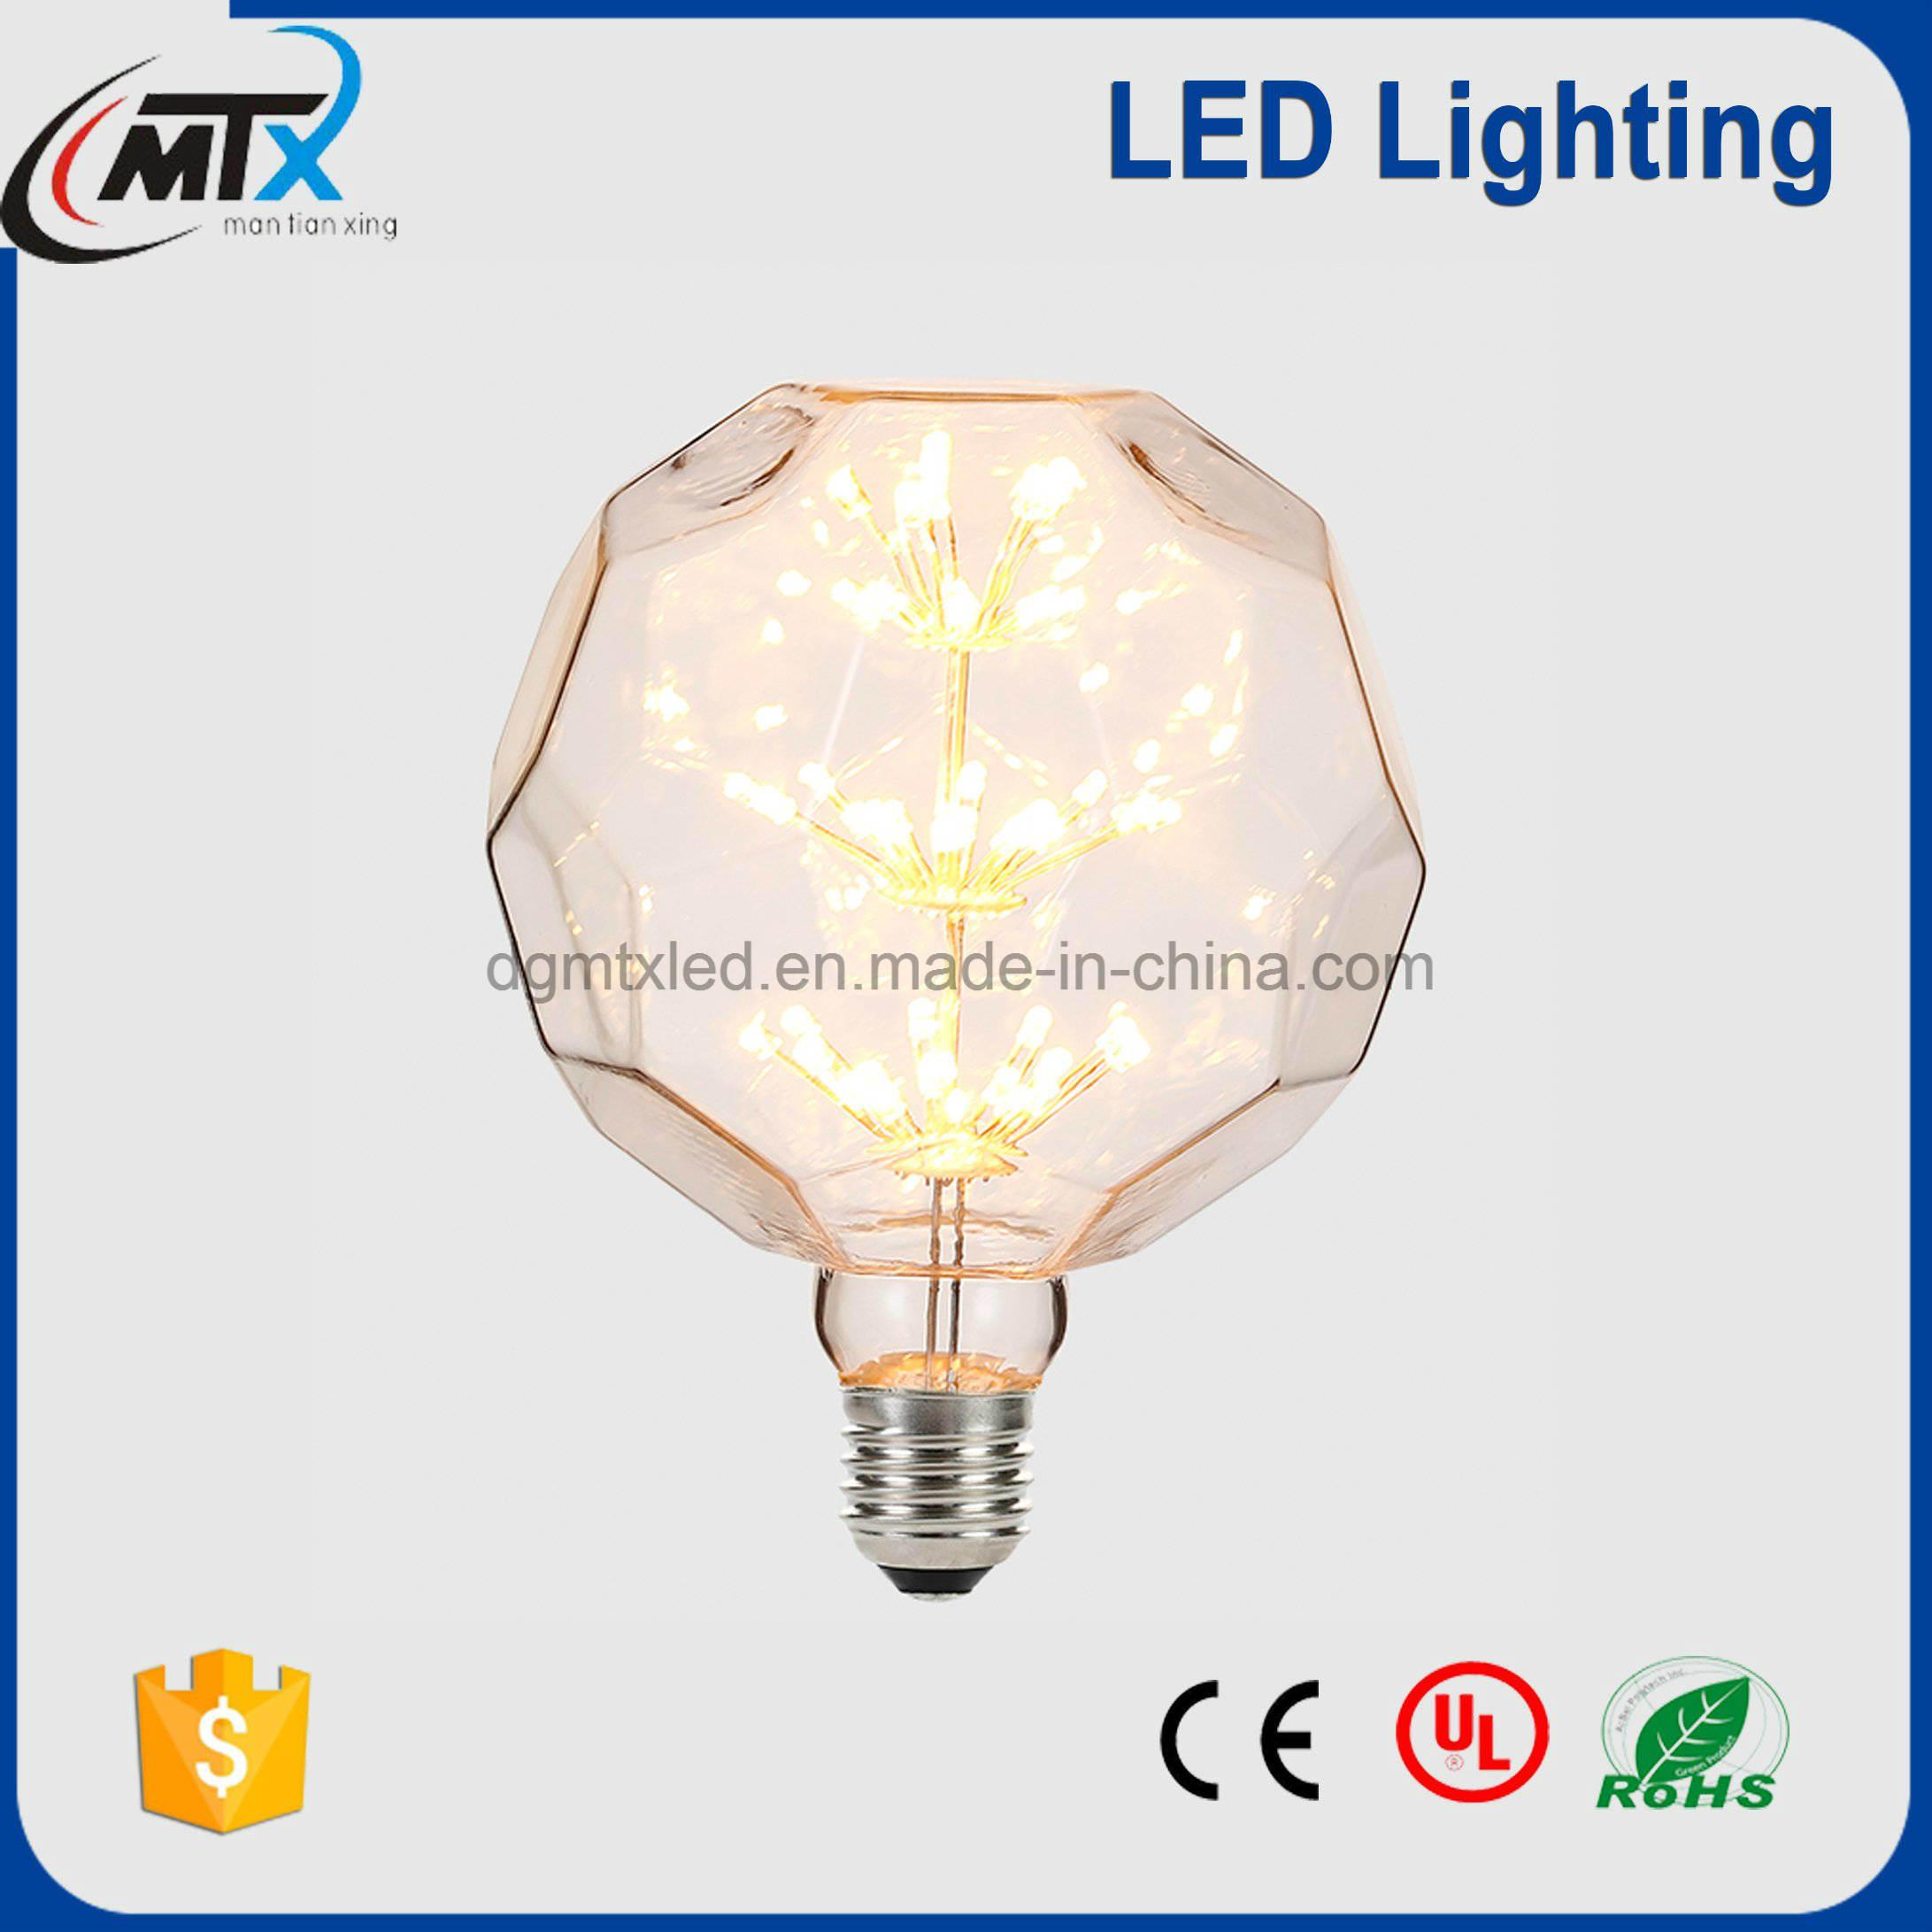 MTX-Football shape Decorative Vintage Retro LED Bulb Light 110V